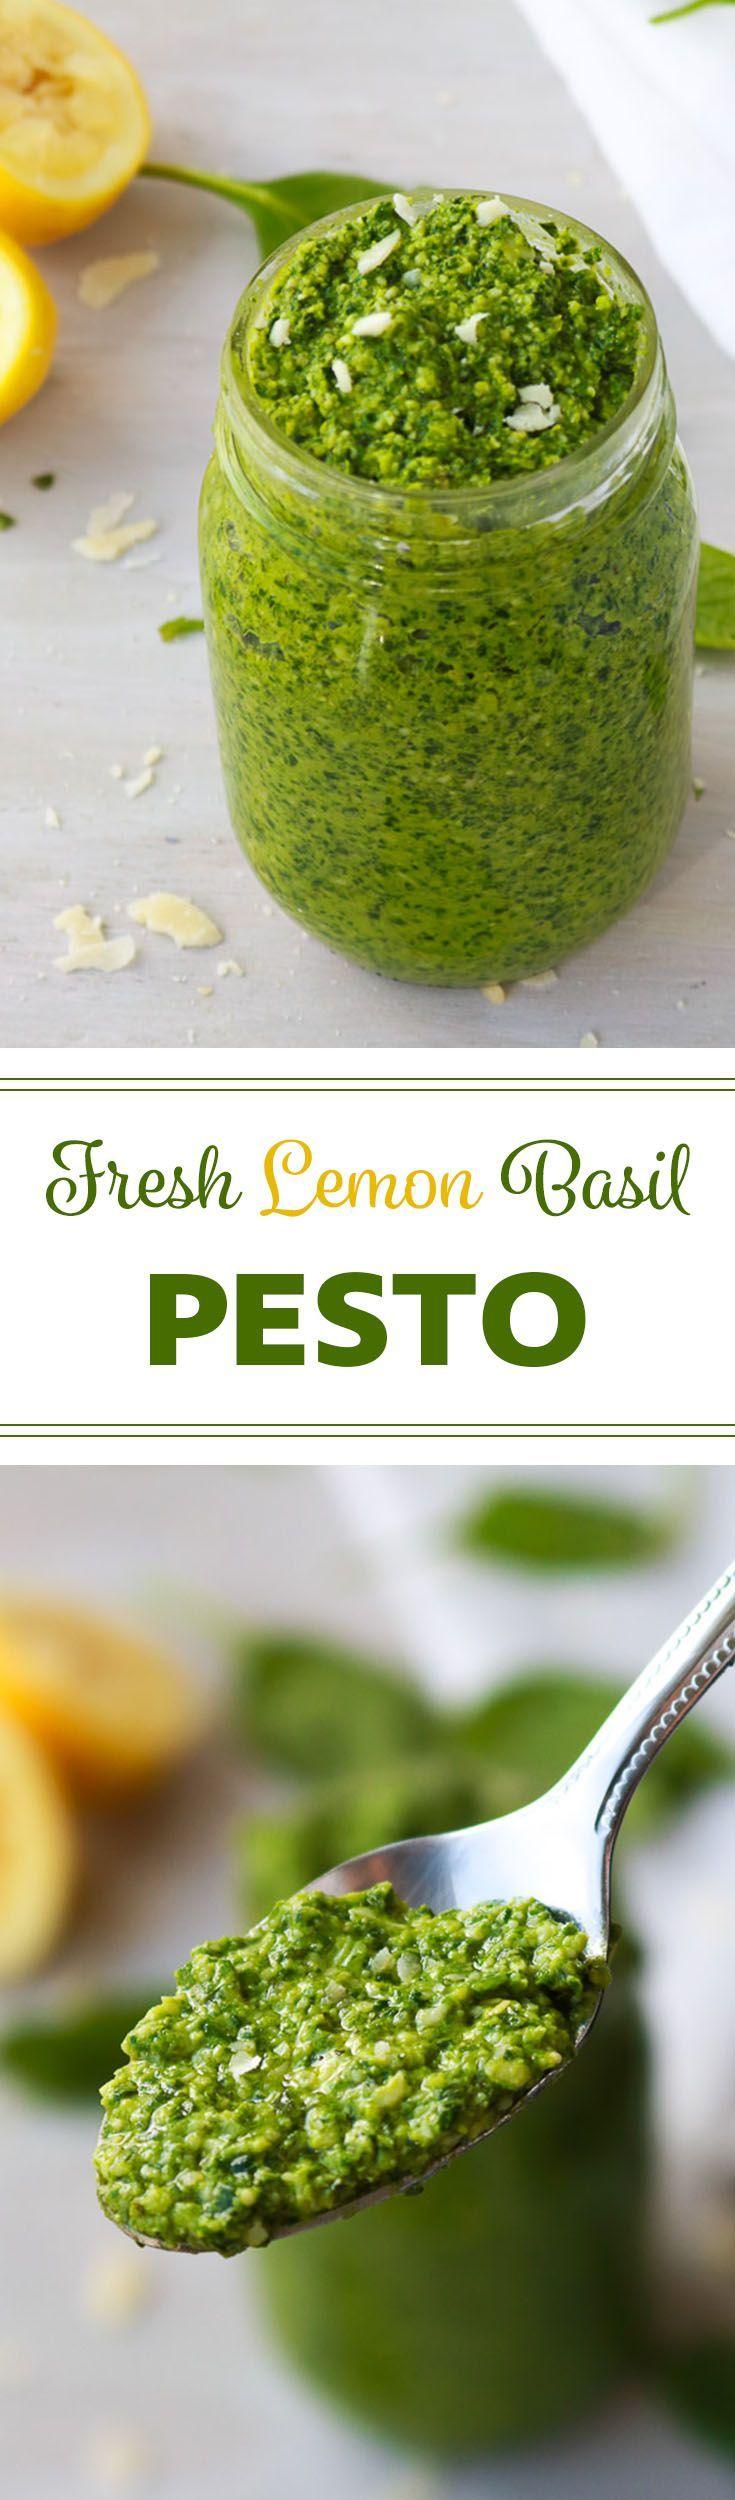 Fresh Lemon Basil Pesto   It just takes a few minutes to make yourself this fresh pesto bursting with outrageously delicious flavour.